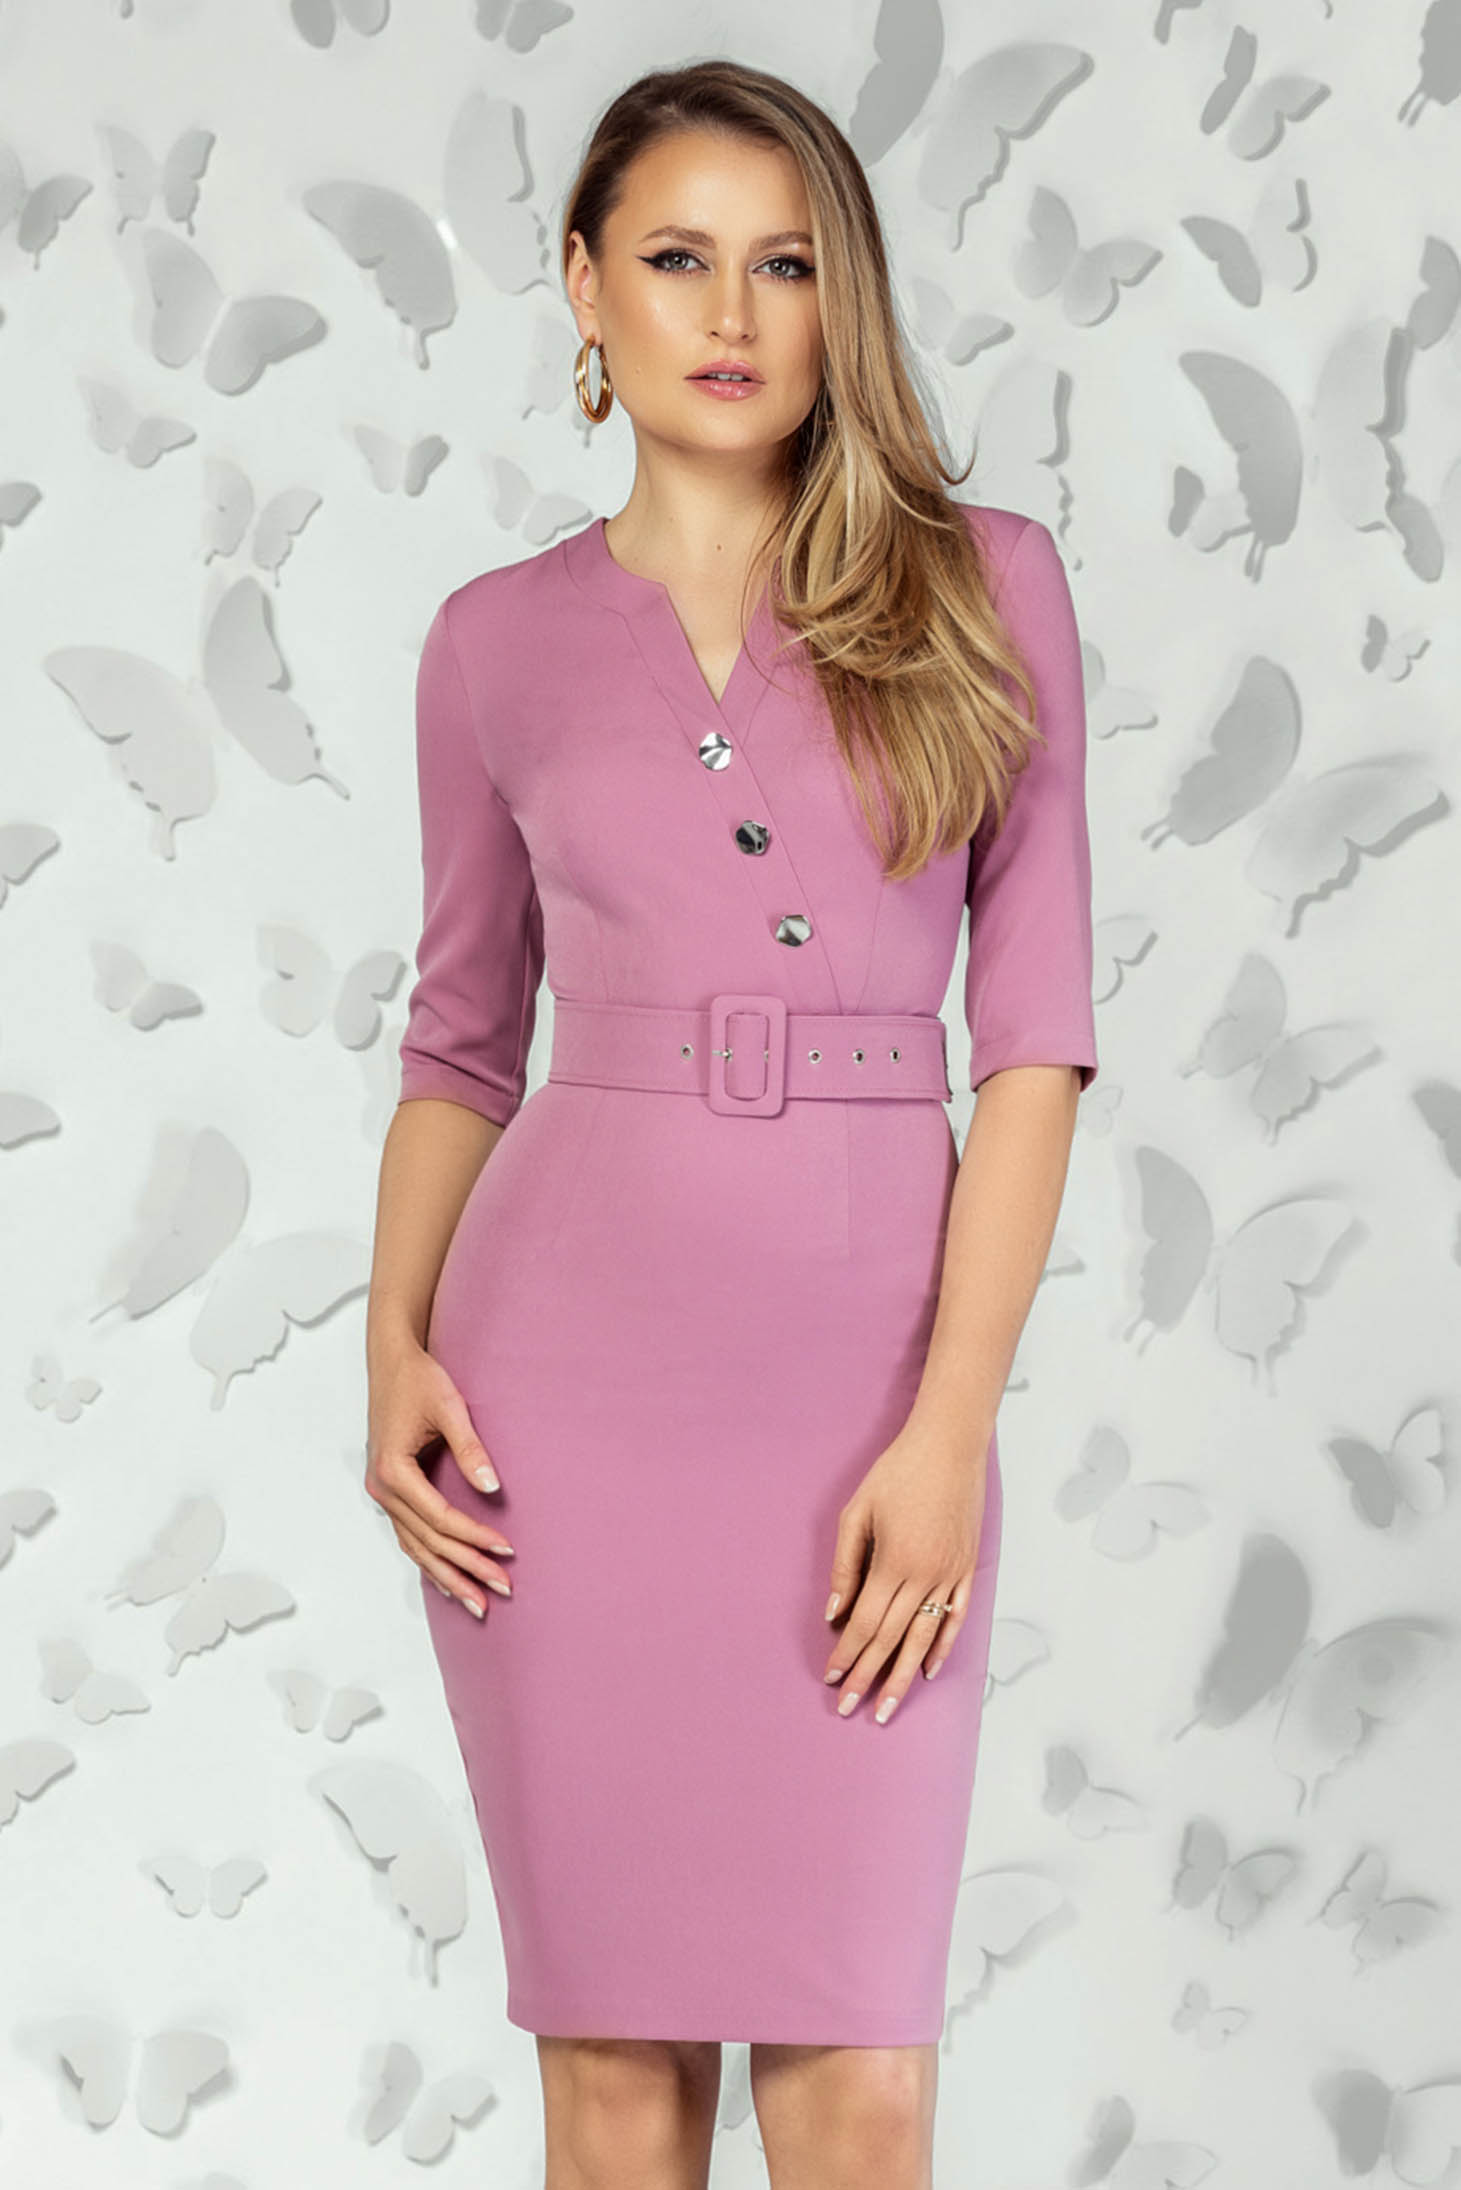 Pink dress office short cut pencil with v-neckline back slit accessorized with belt